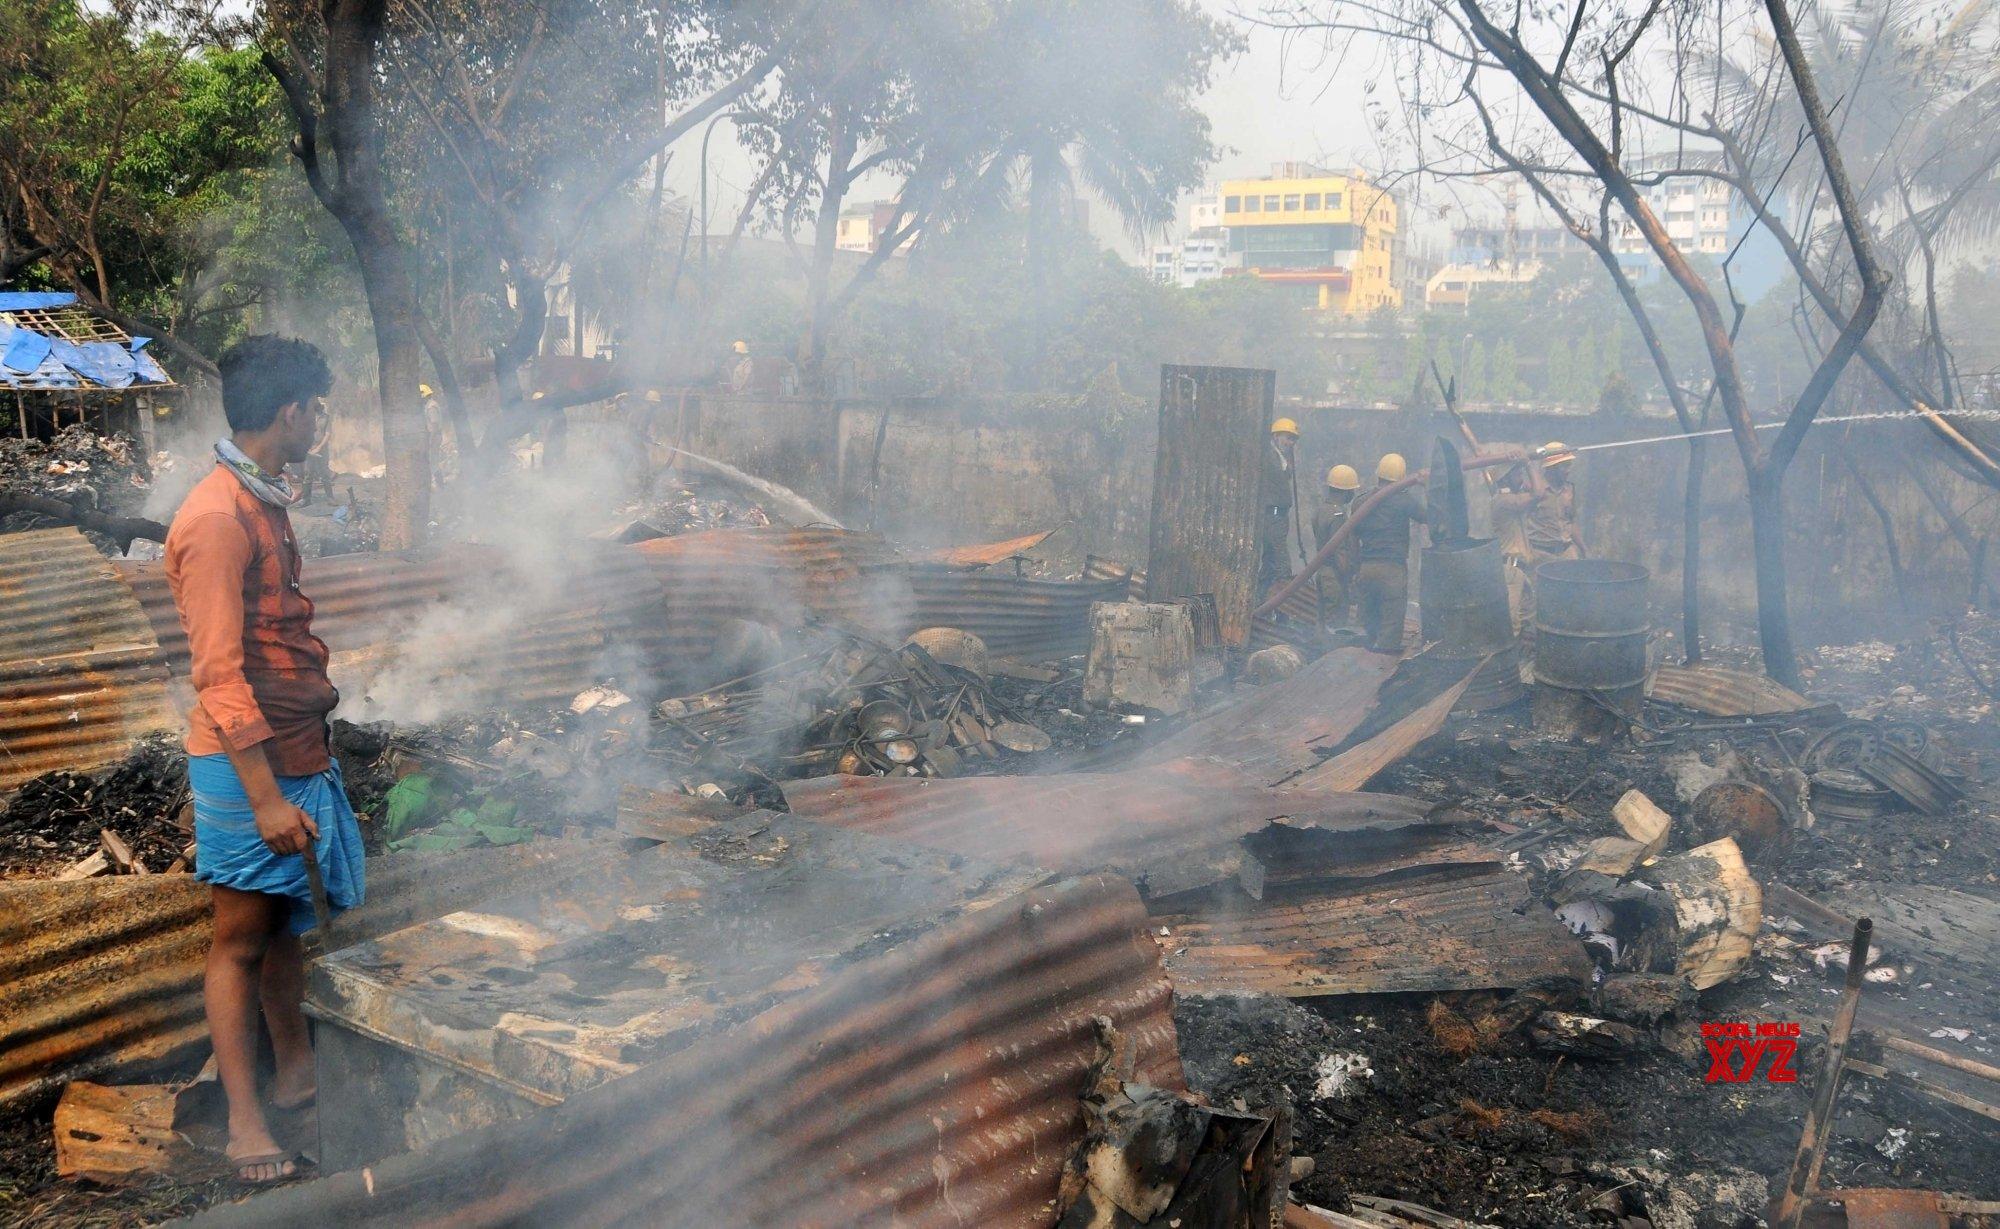 Kolkata: Firefighters fighting against fire in a slum area #Gallery